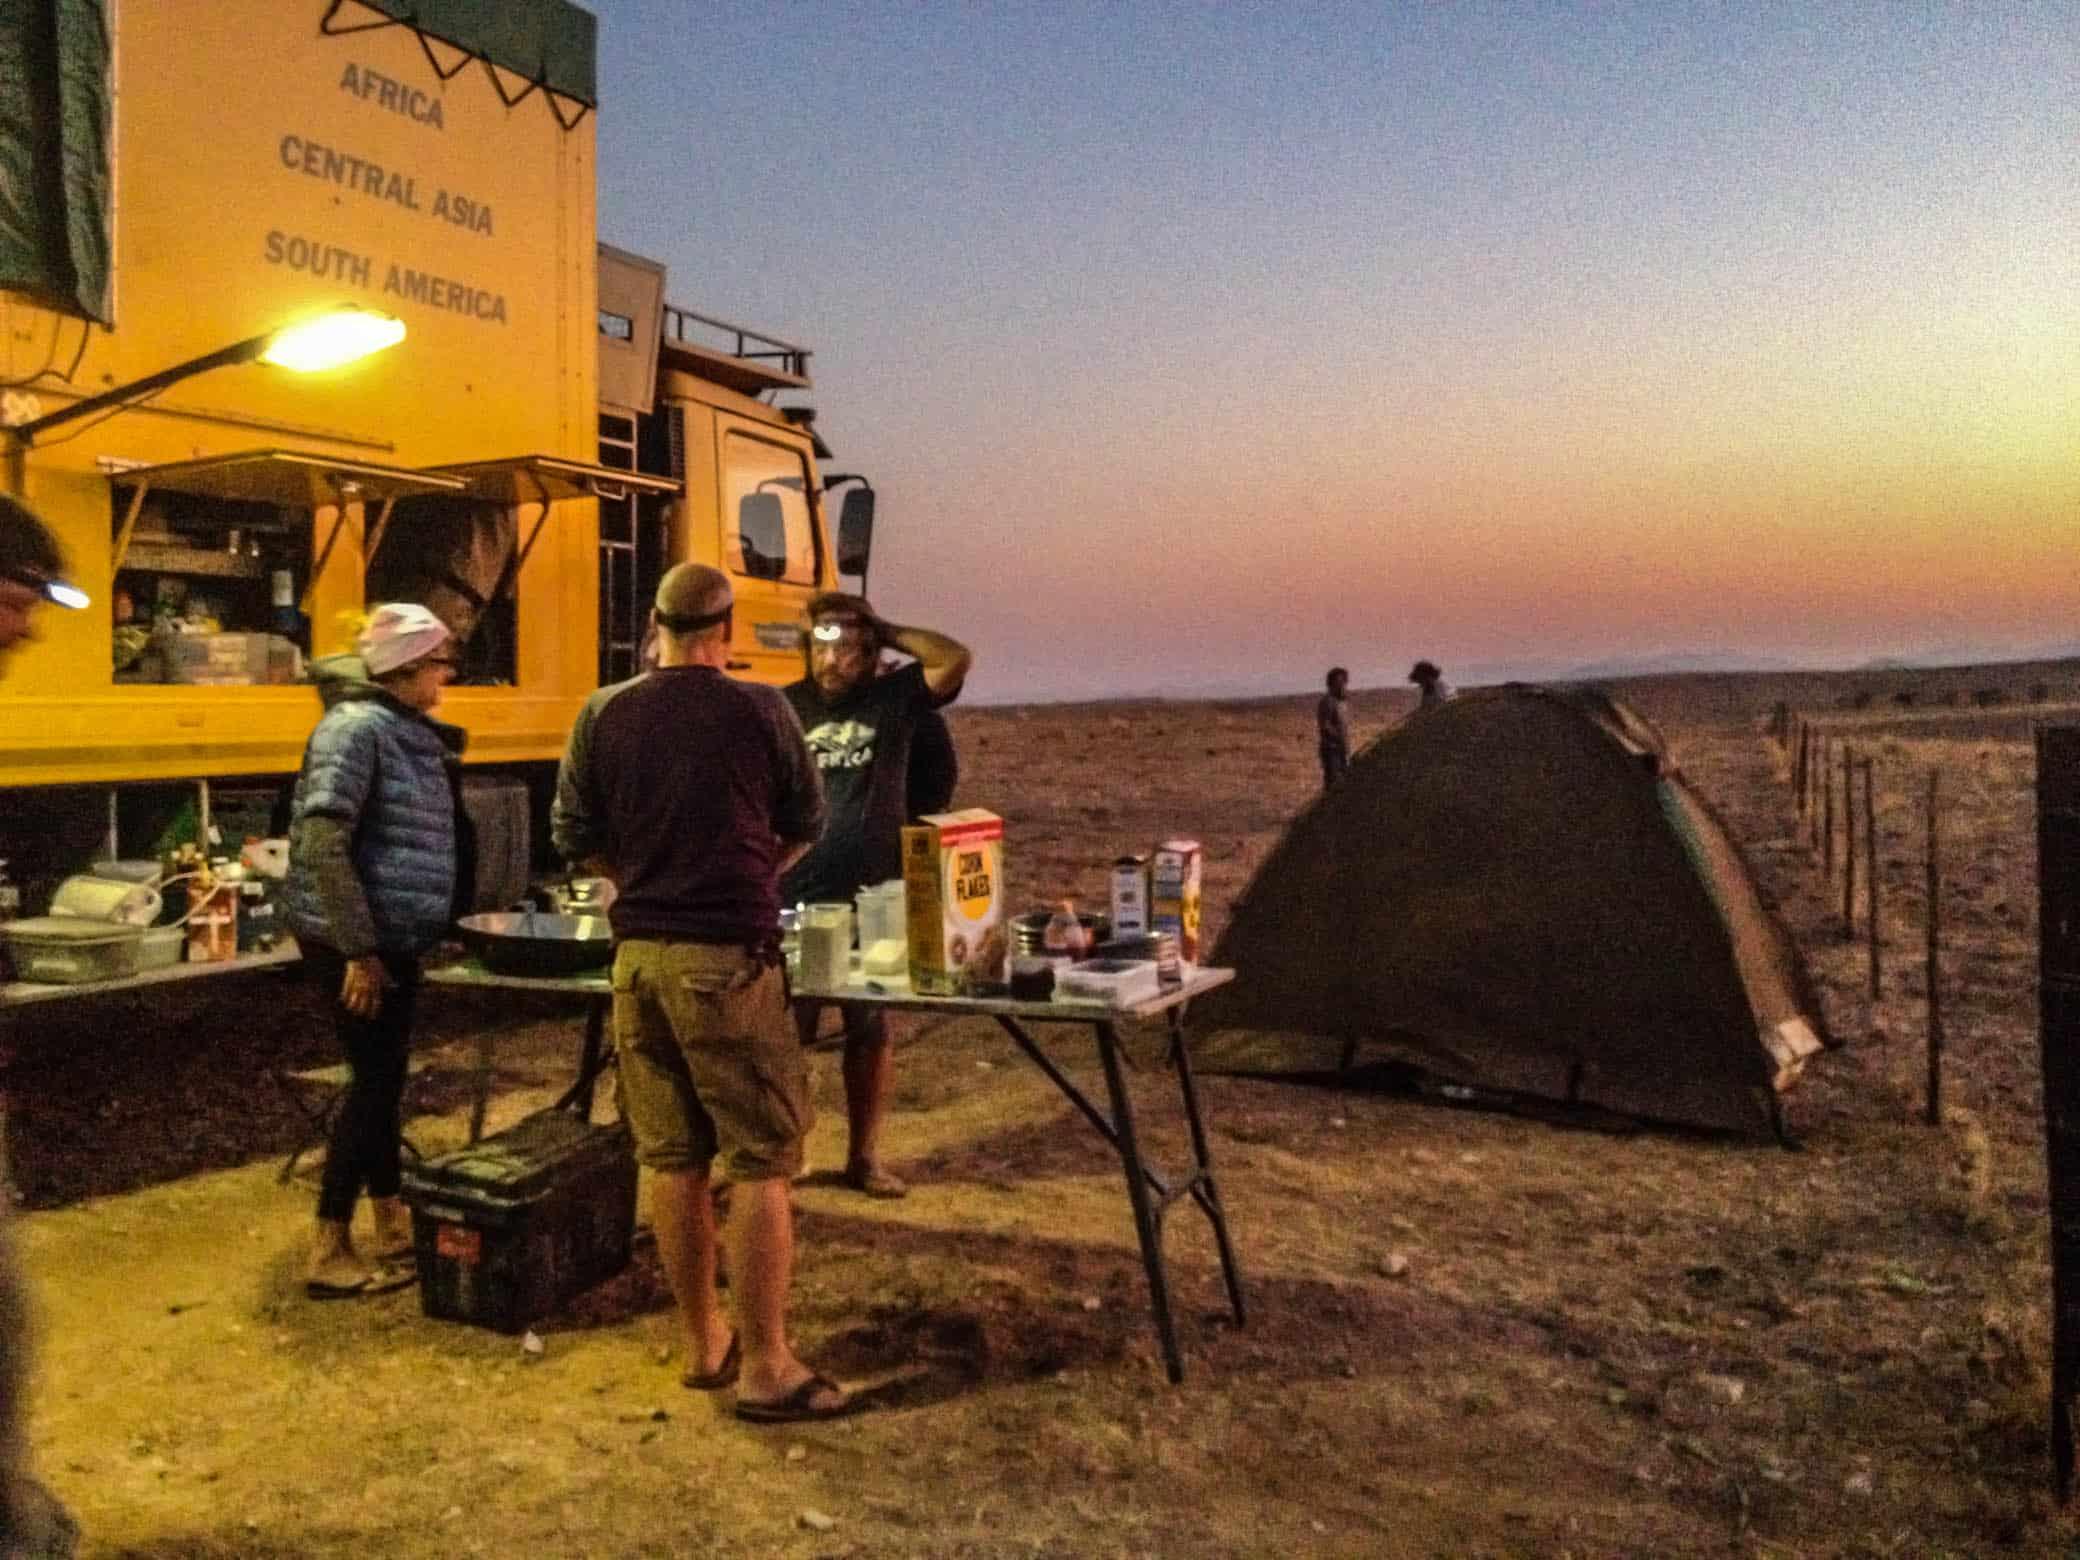 Overland through Africa